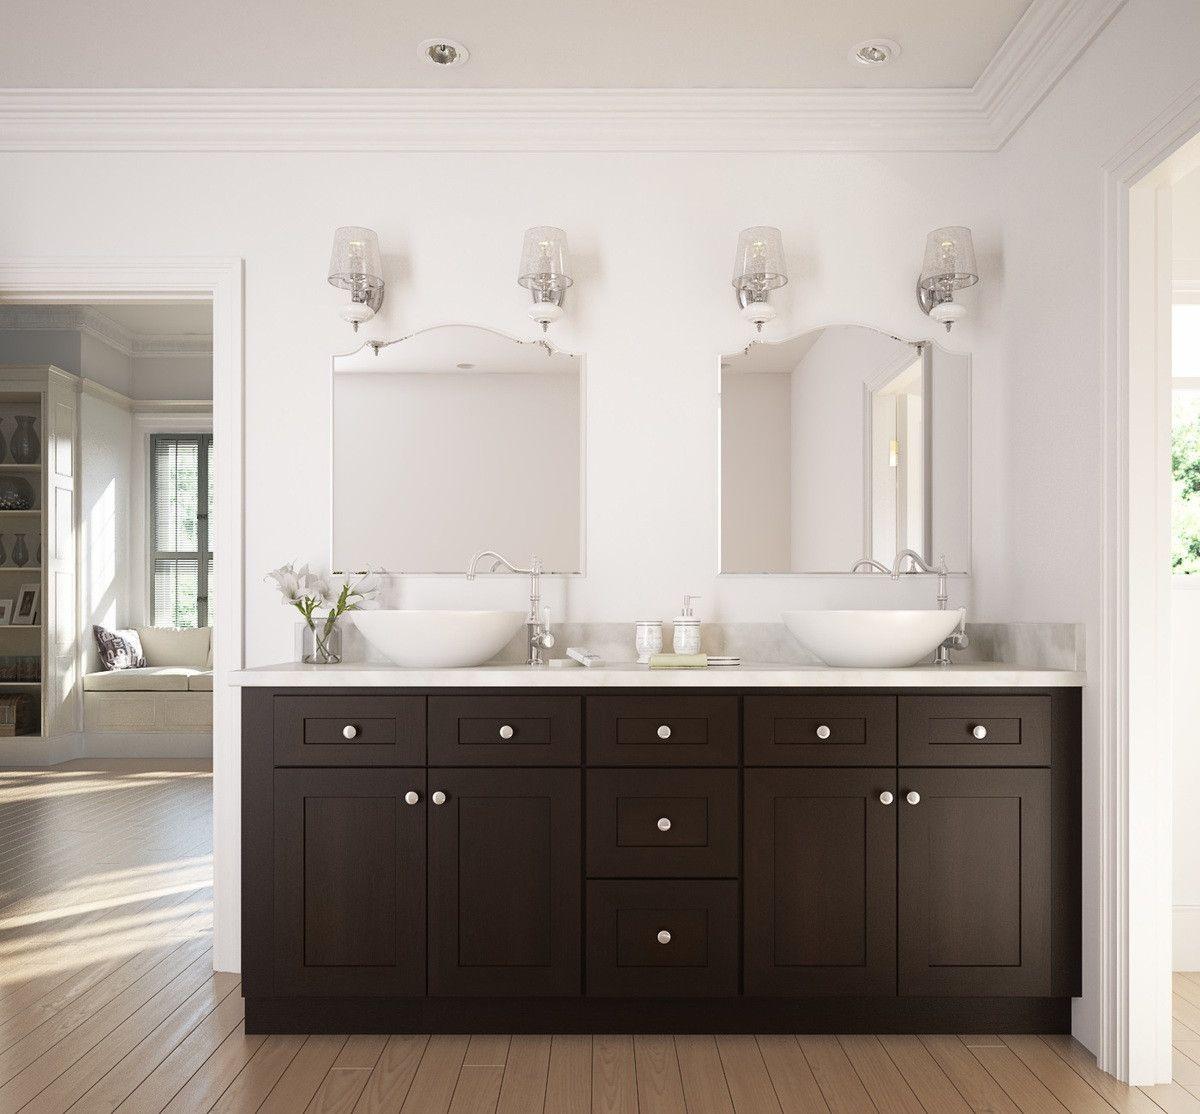 77 Pre Embled Bathroom Cabinets Corner Kitchen Cupboard Ideas Check More At